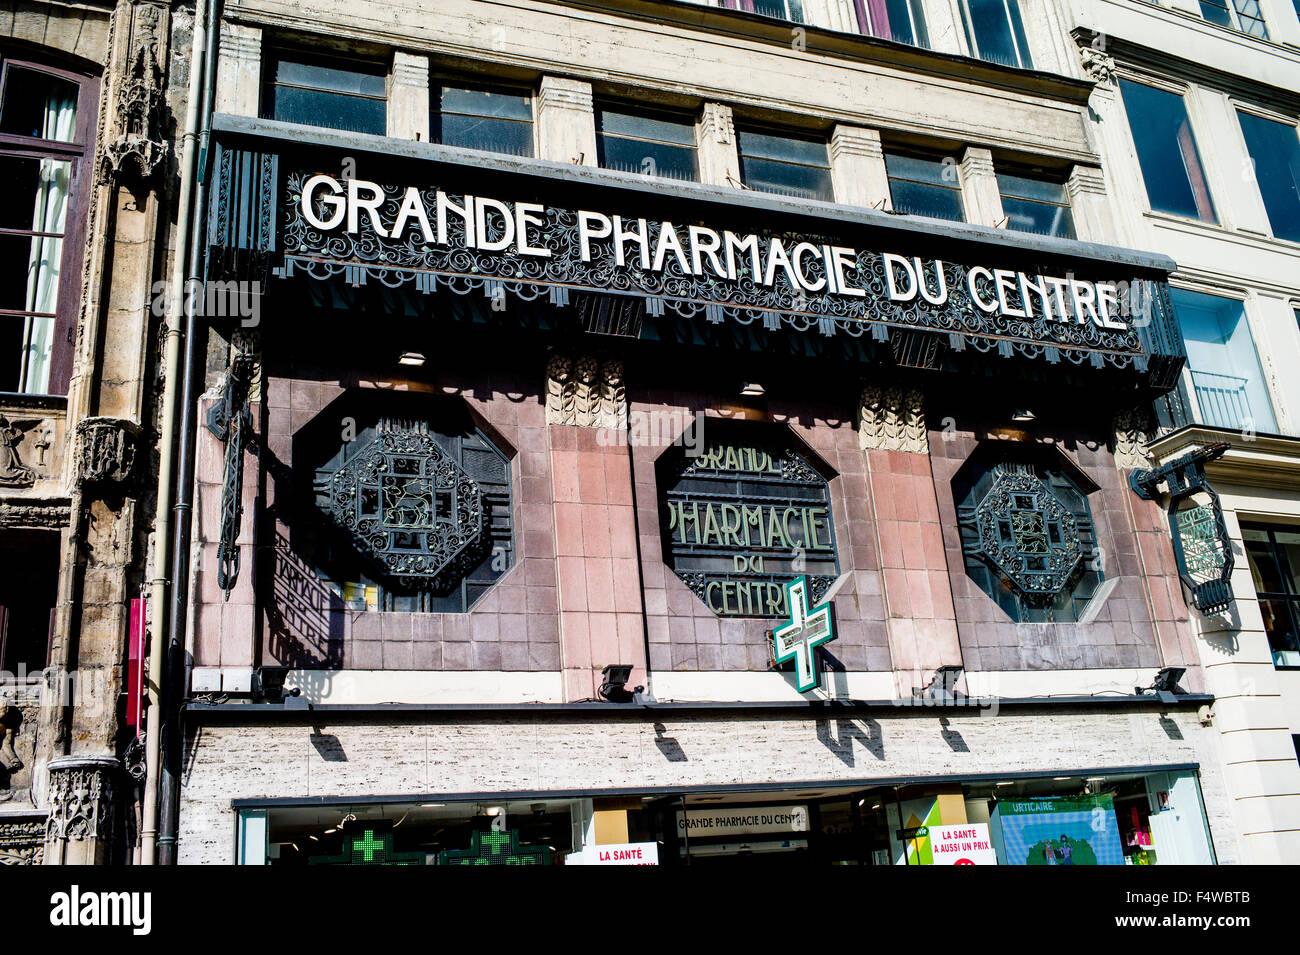 pharmacie discount rouen